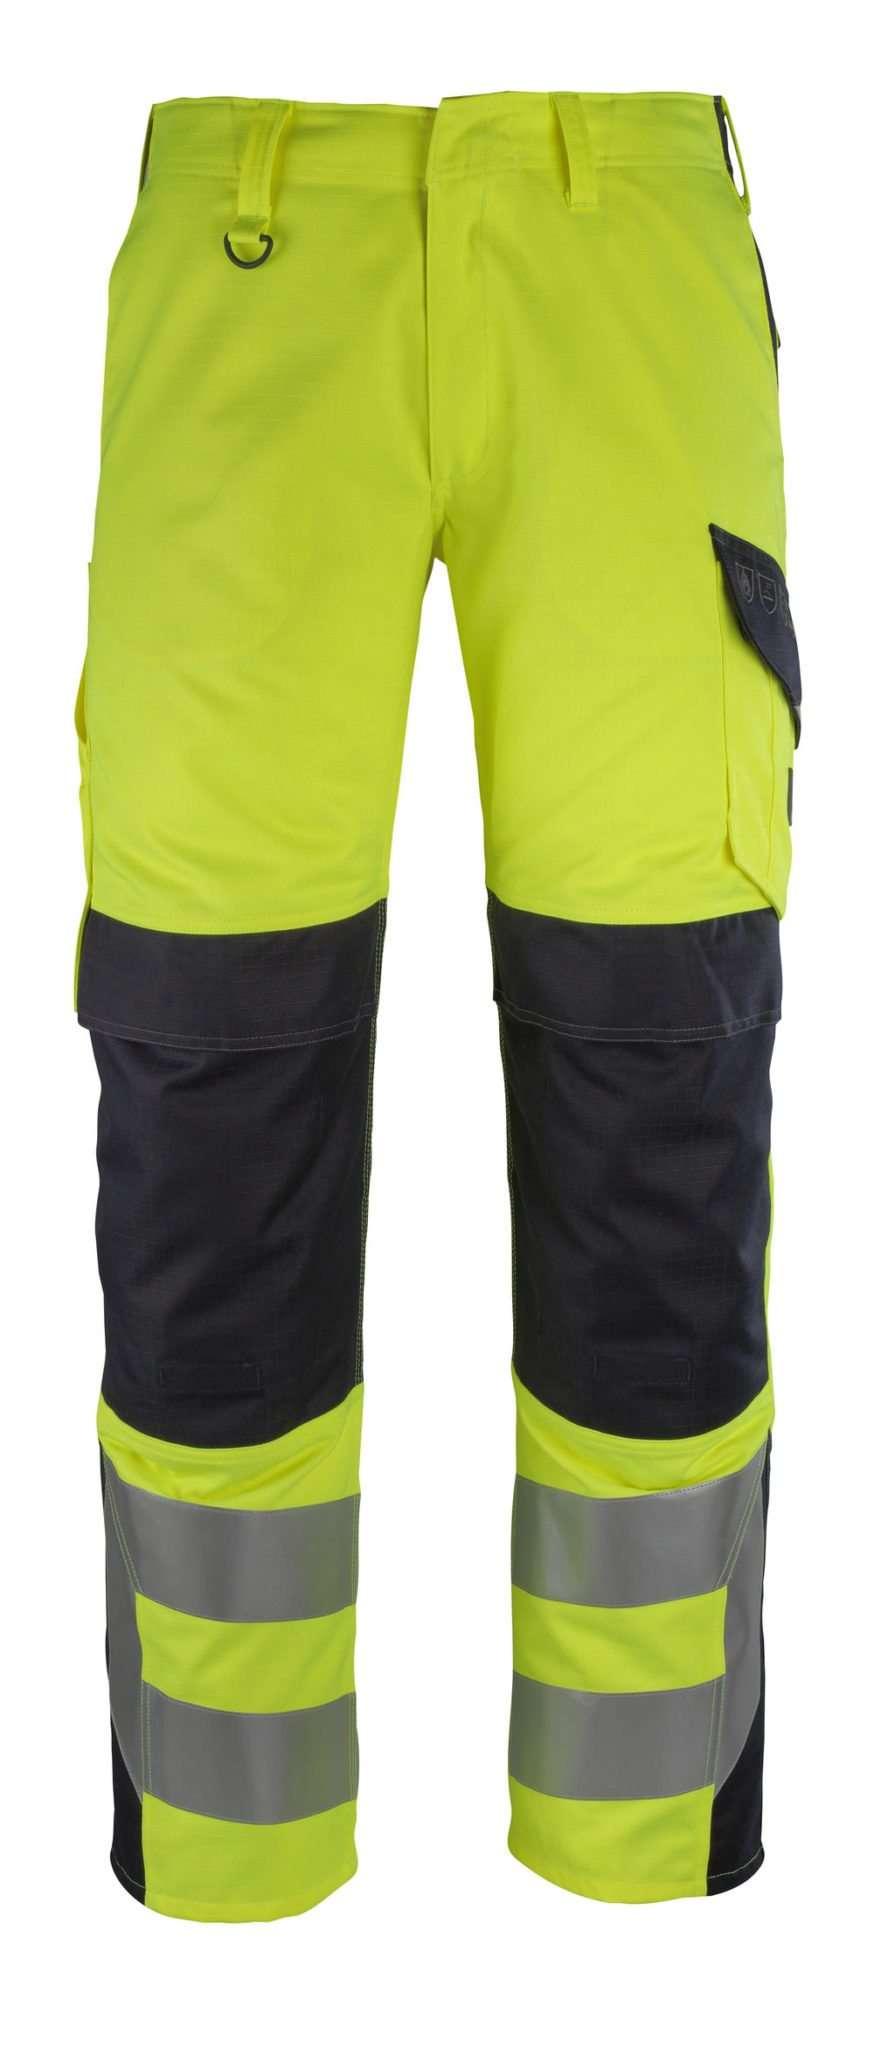 Mascot® Arbon Yellow Flame Retardant Trousers